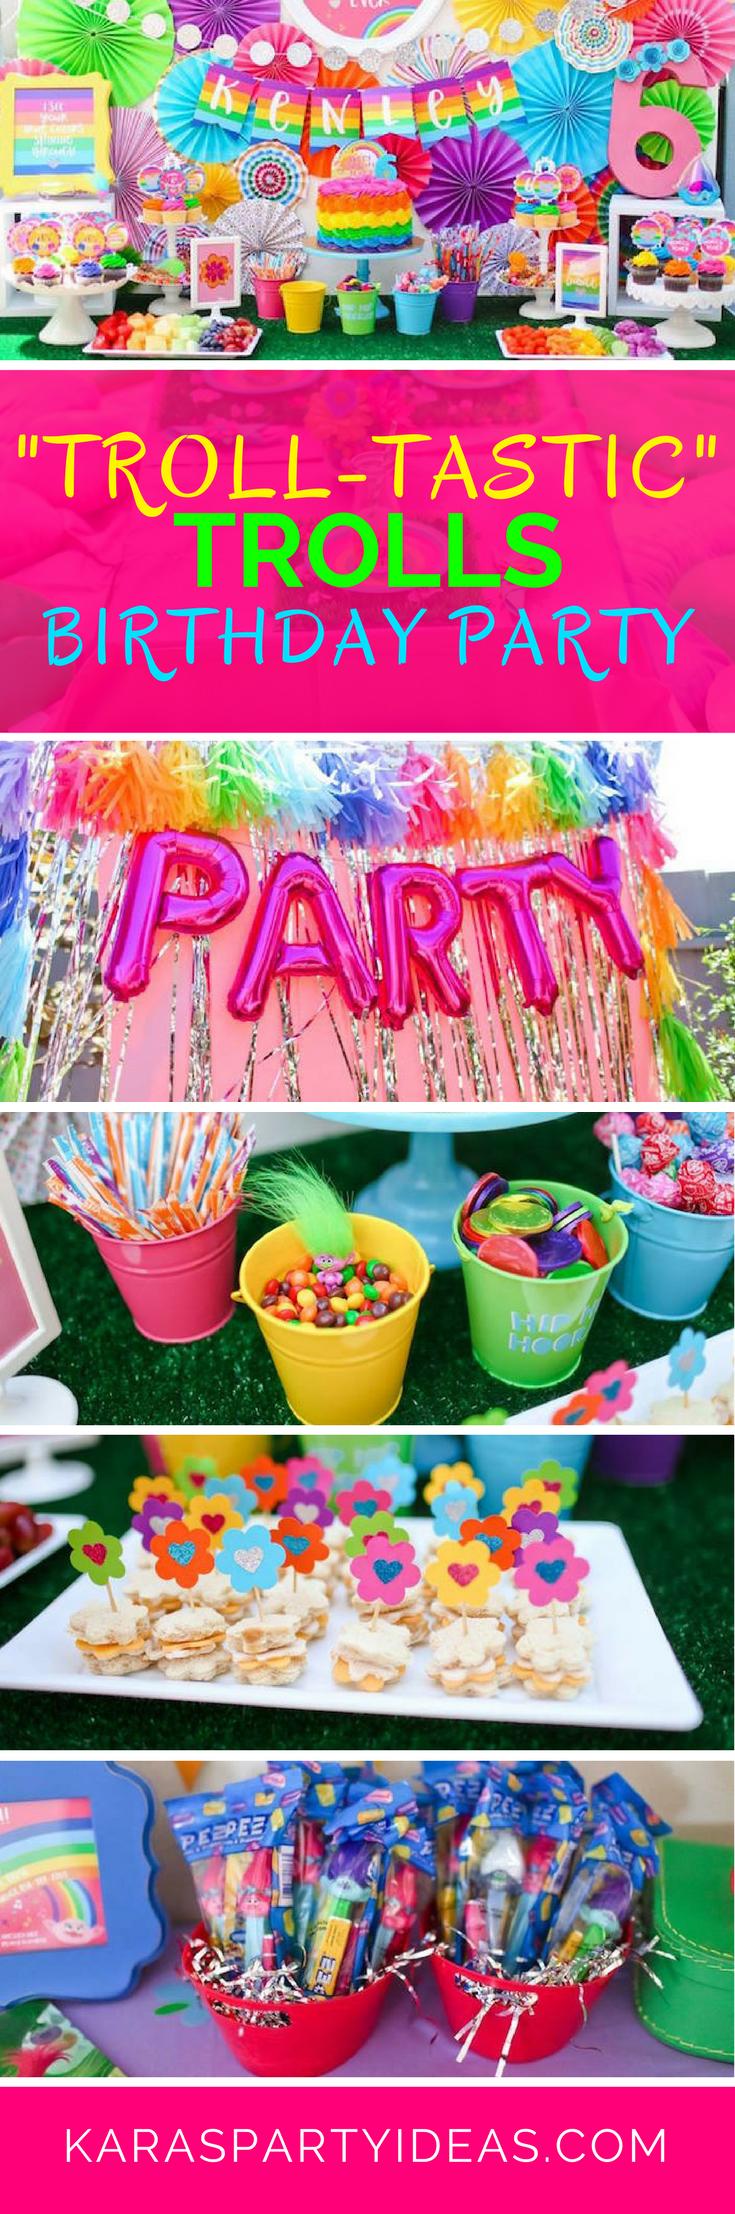 Tea time tea birthday party via kara s party ideas karaspartyideas com - Troll Tastic Trolls Birthday Party Via Kara S Party Ideas Karaspartyideas Com